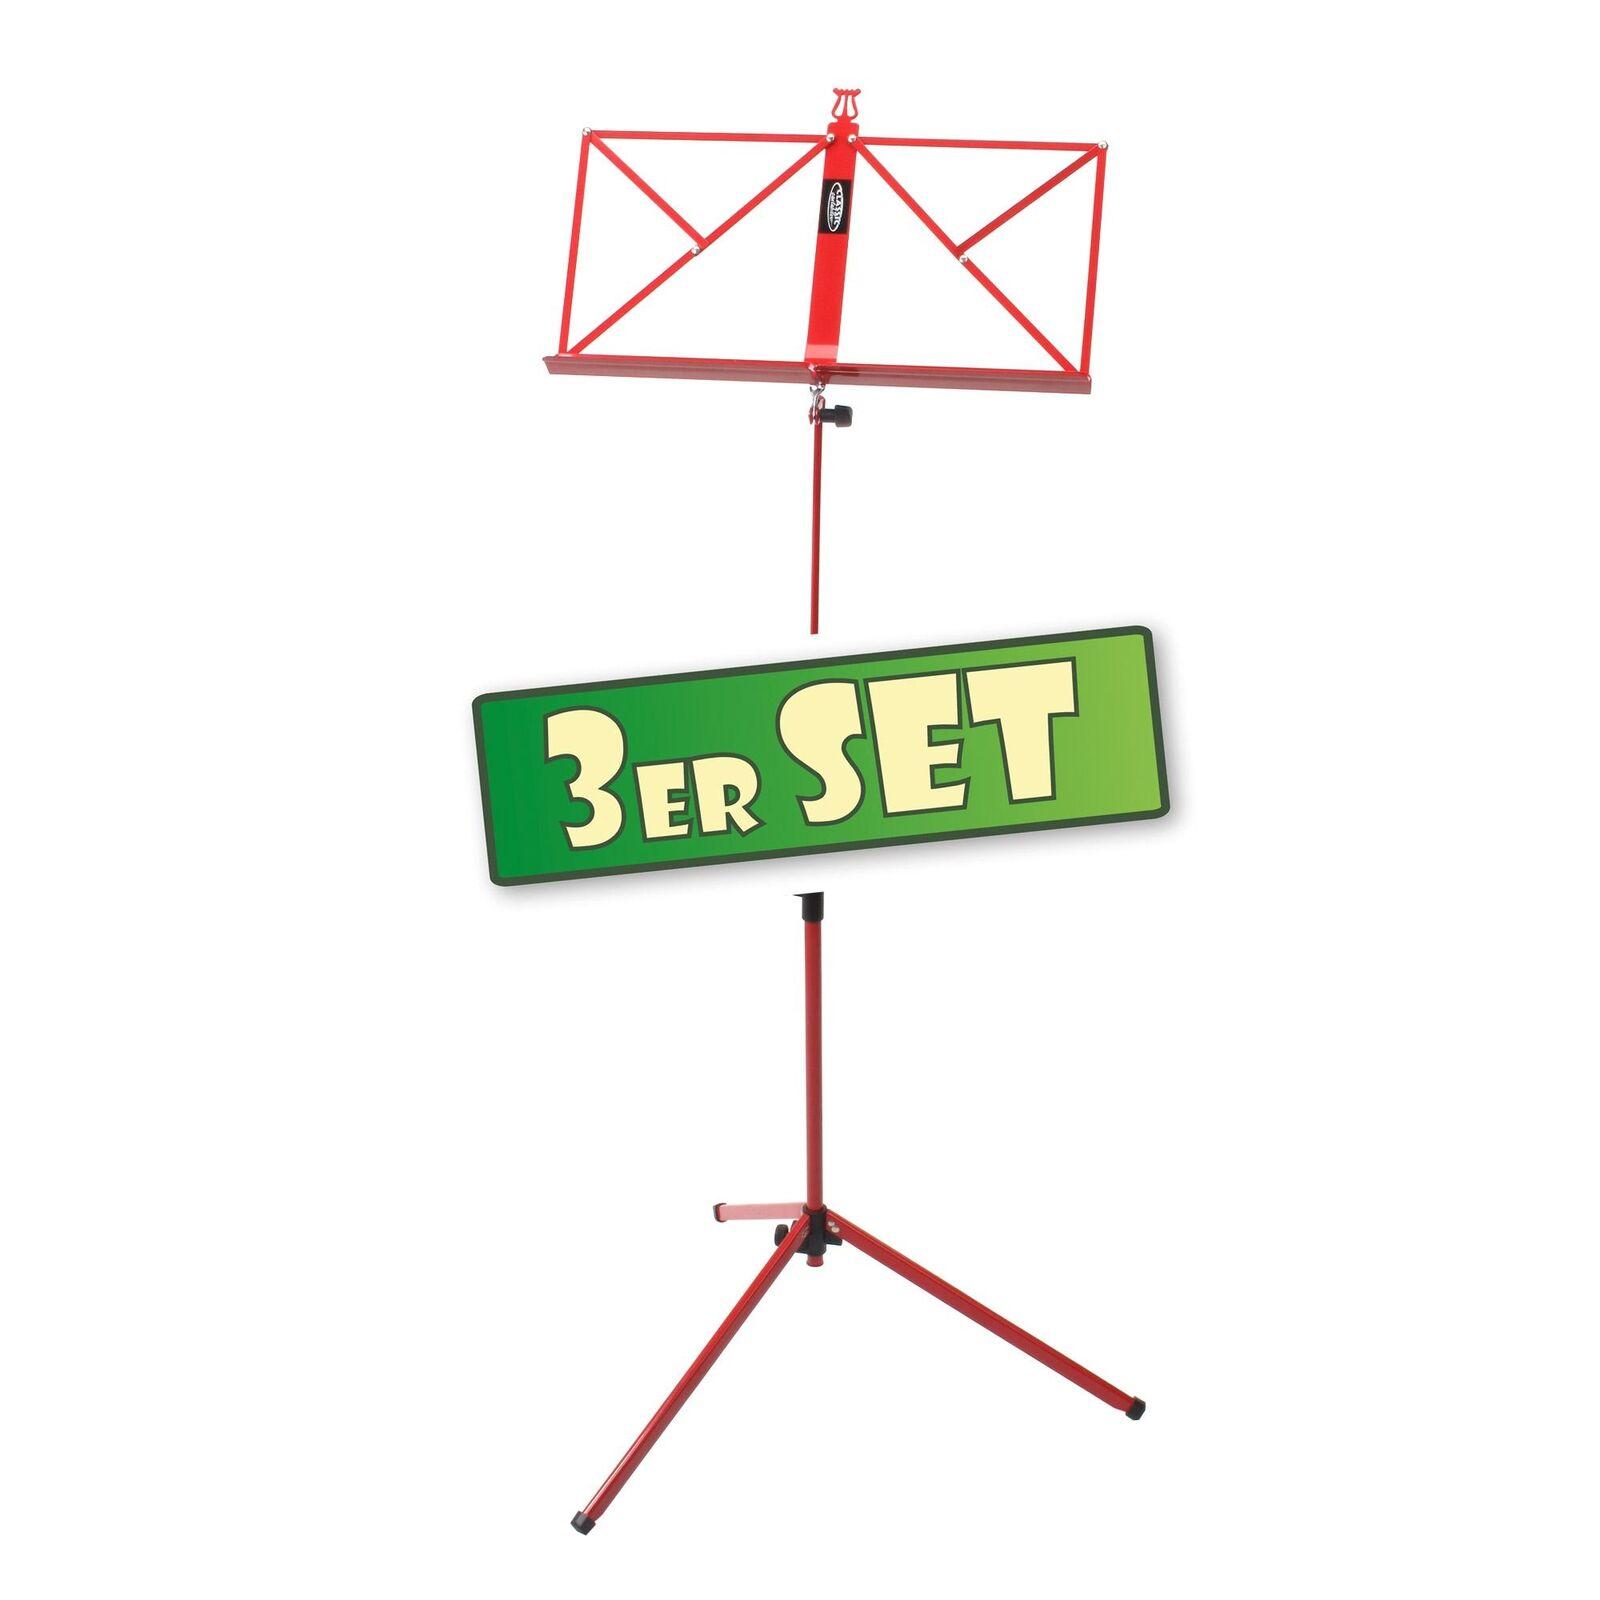 3x metal notas soporte notas stand notenpult notas trípode trípode trípode notas soporte estable rojo f92984